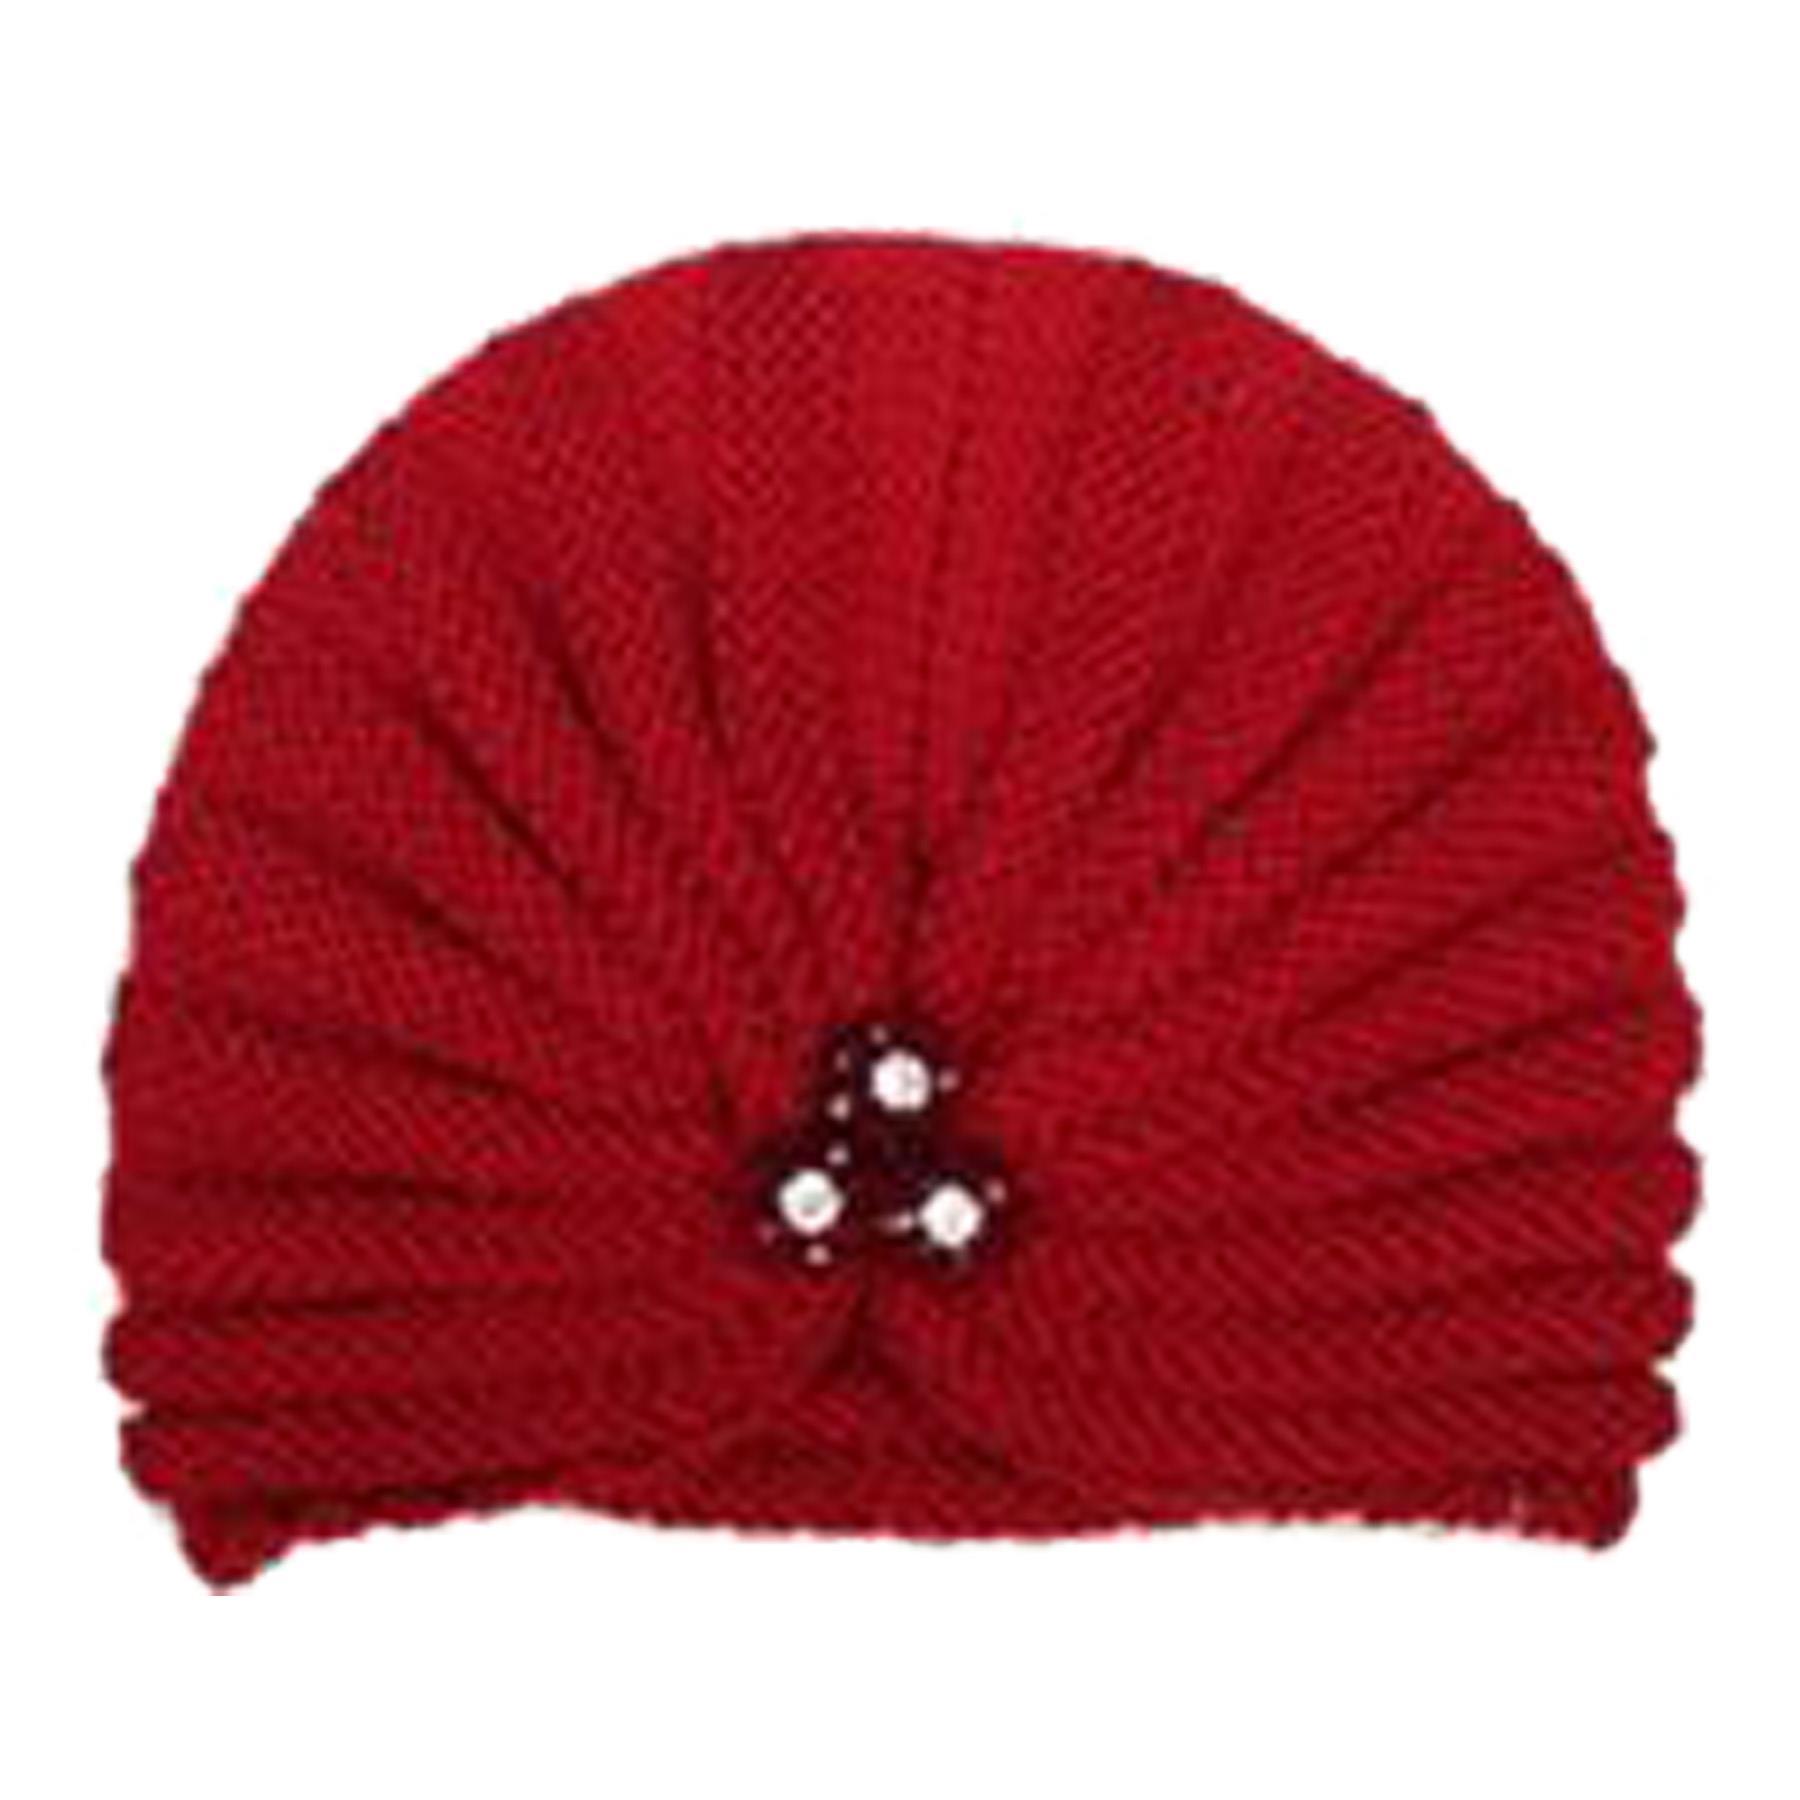 New-Women-s-Pleated-Knitted-Acrylic-Jewel-Detail-Headwear-Turban-Cap thumbnail 9